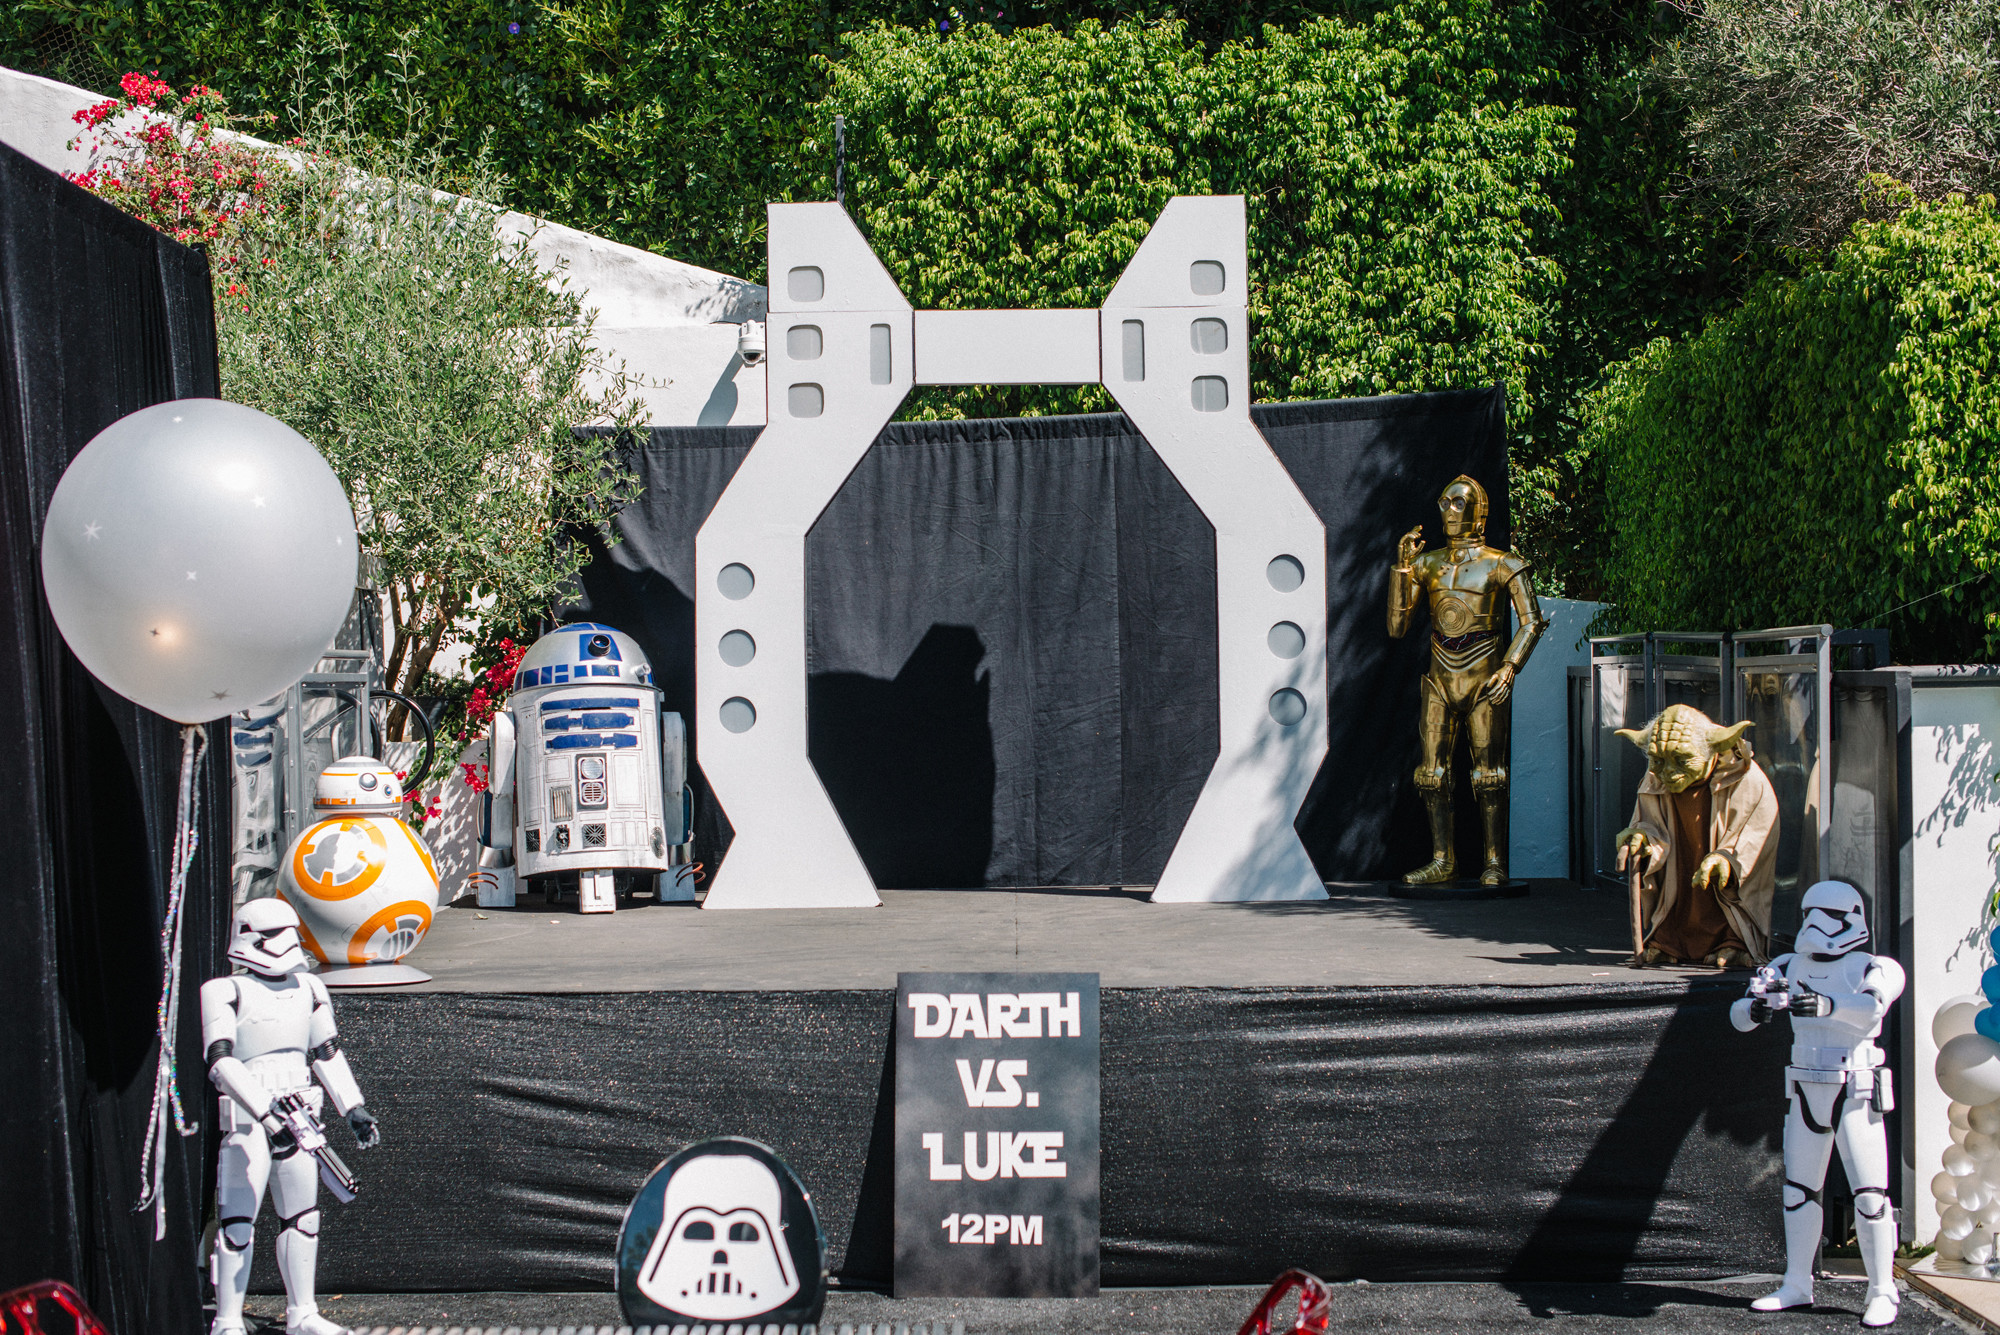 tarynco-events-starwars-themed-kids-birthday-party-cp3o-r2d2-stormtrooper-yoda-props.jpg